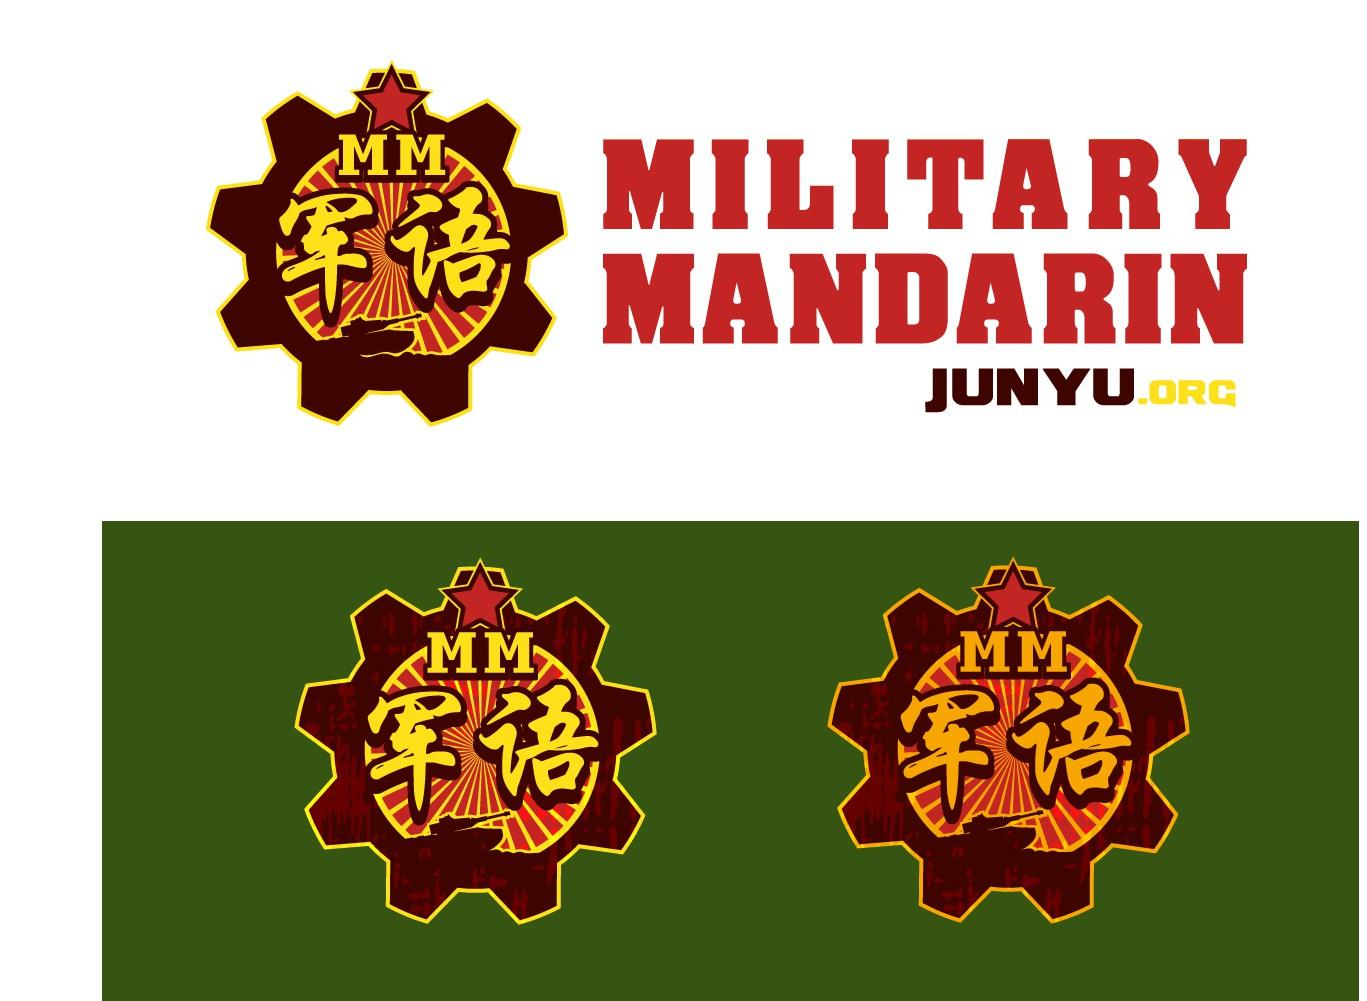 Brand Reboot for Military Mandarin, thinking Retro Propaganda